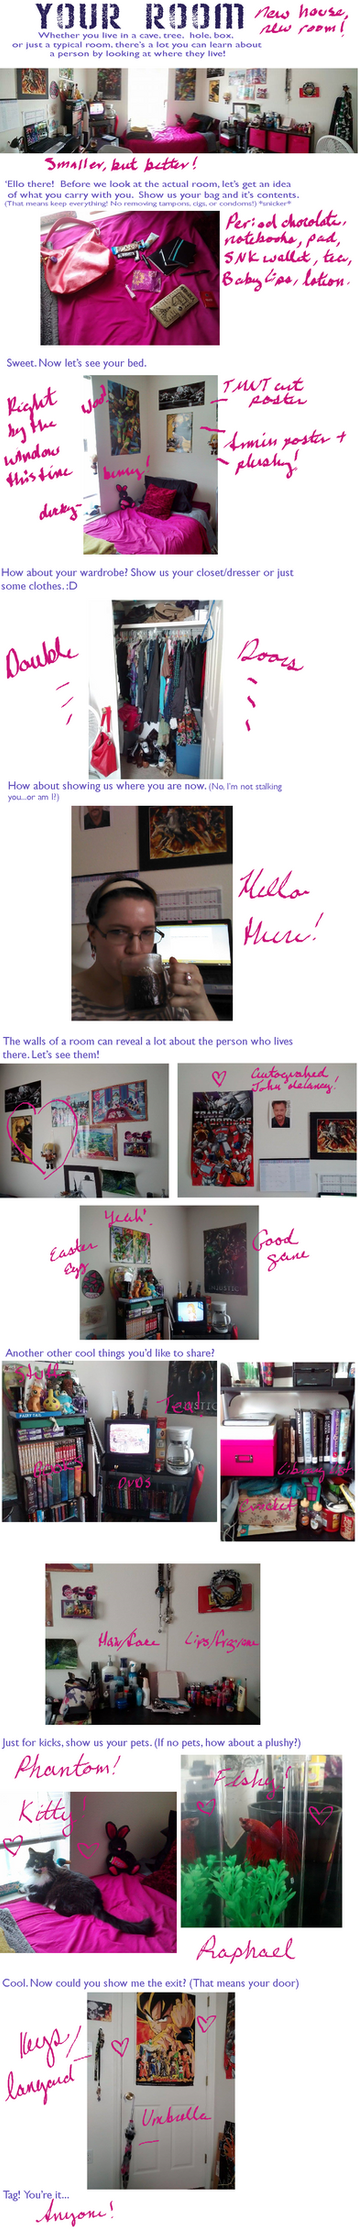 Room Meme, Take 3 by Angelia-Dark